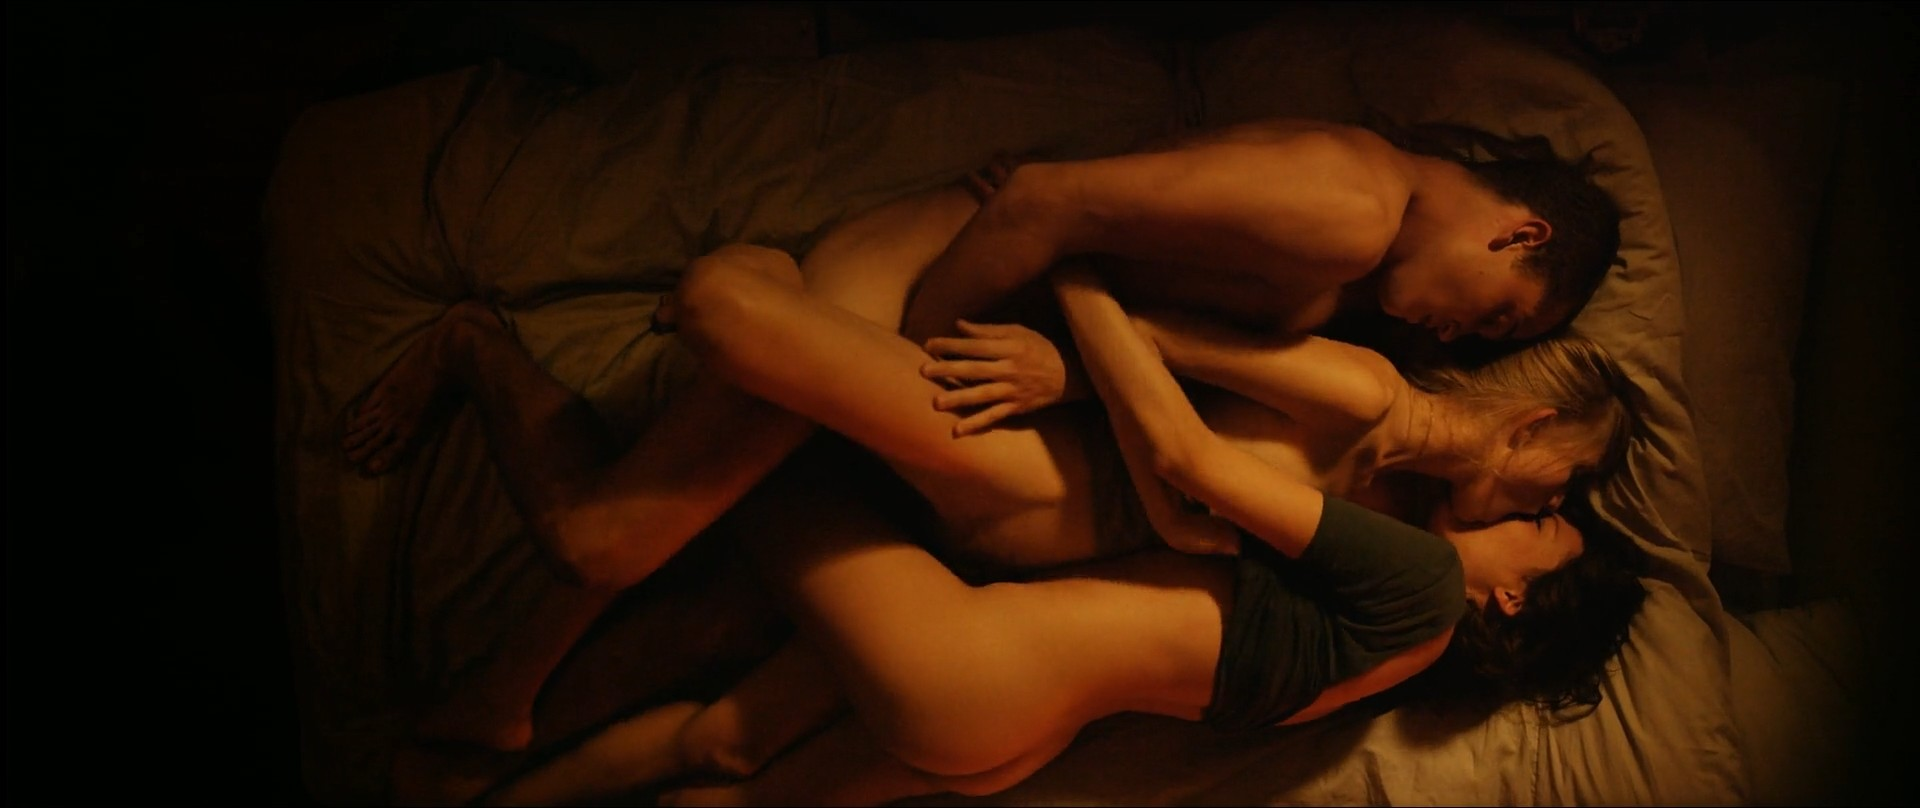 seksualnye kadry kino 71